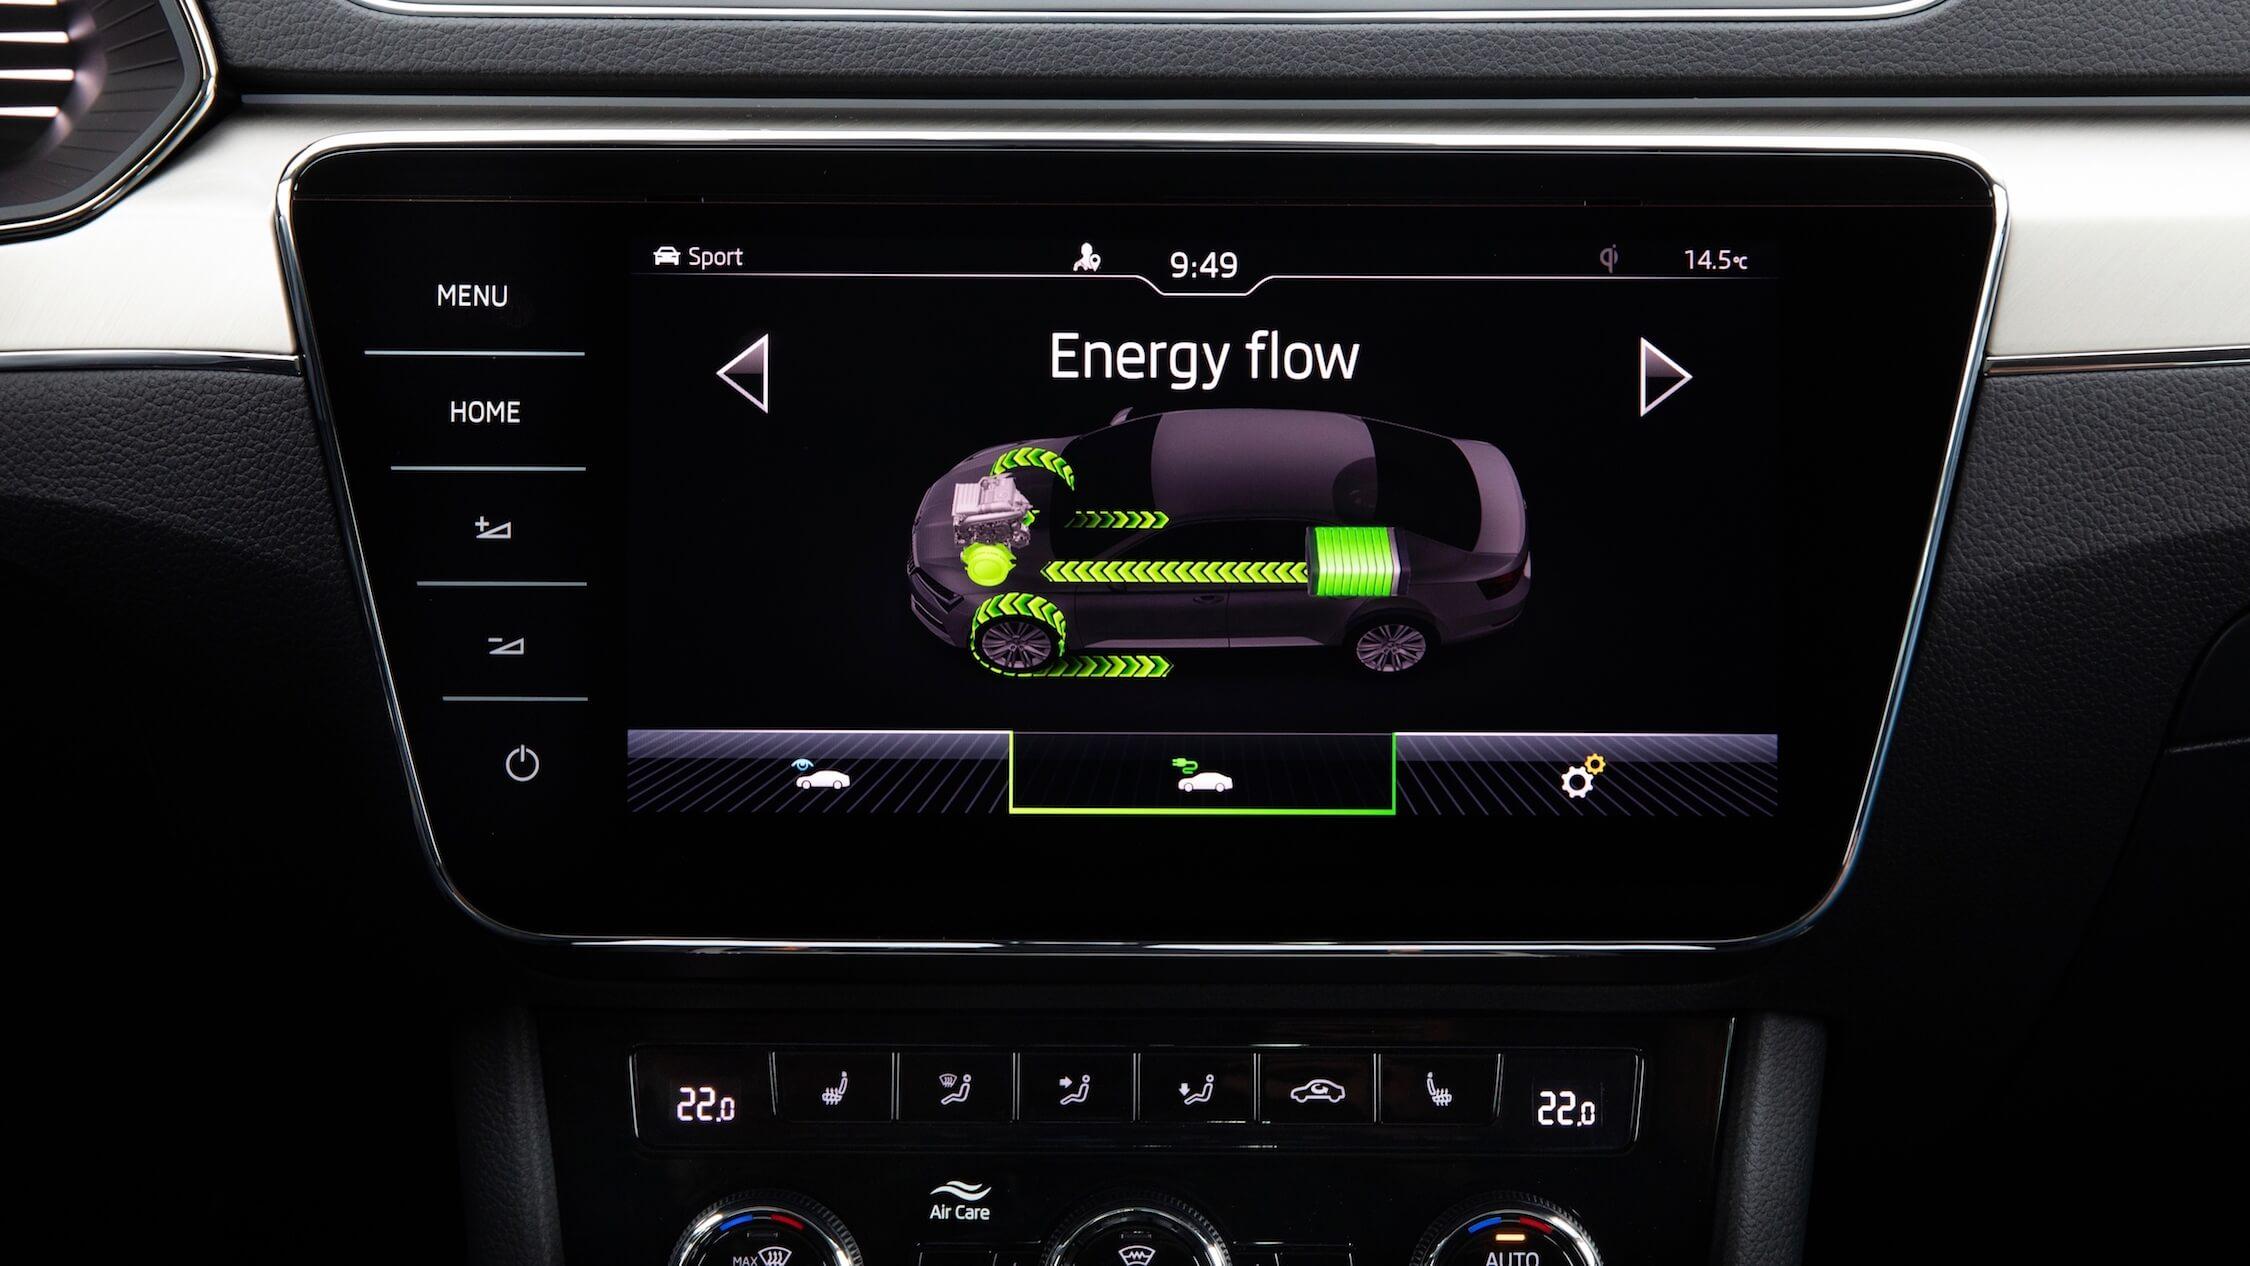 plug-in hybride Skoda Superb scherm met batterij percentage